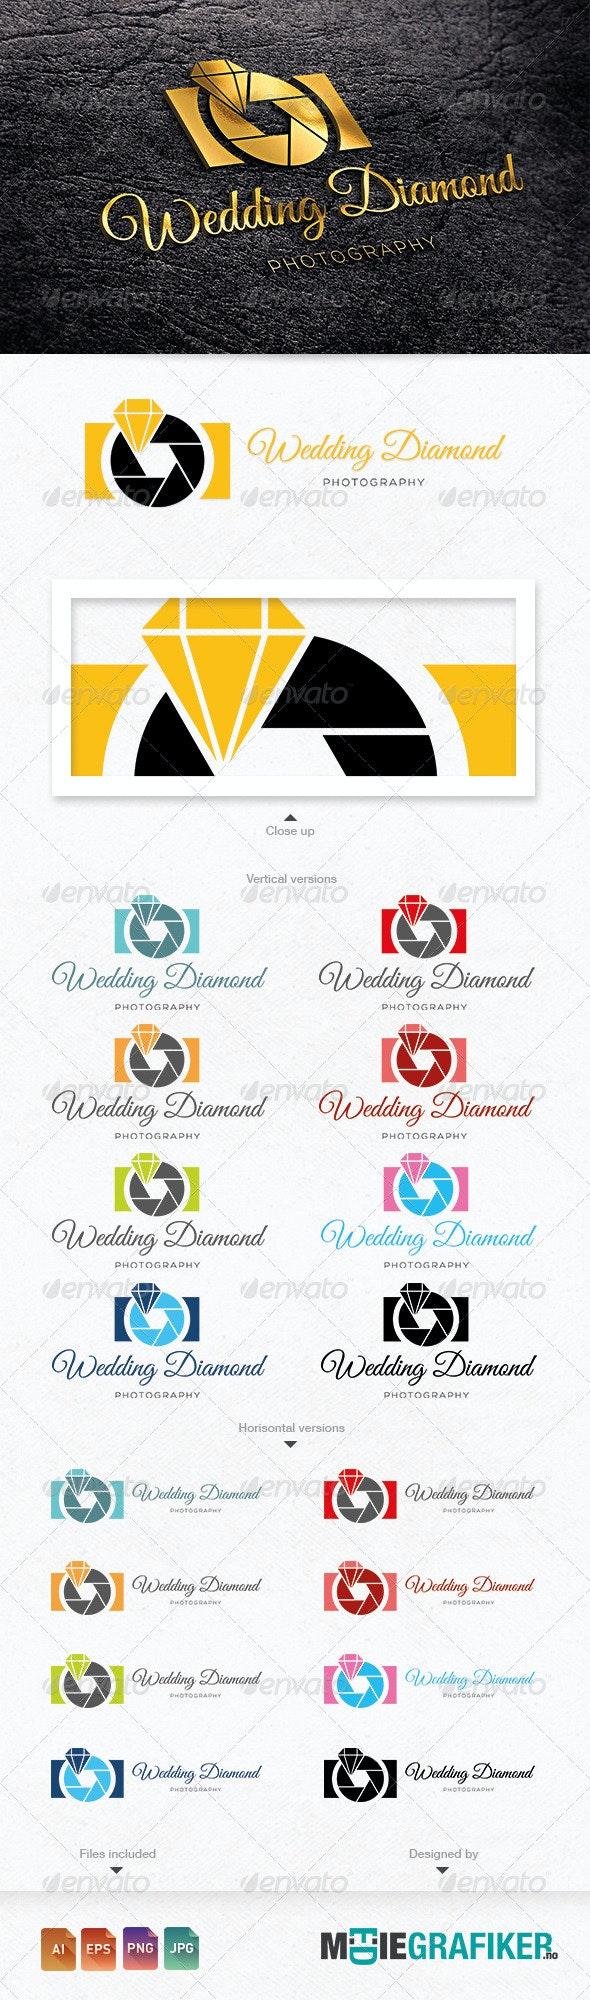 Wedding Diamond Photography Logo - Objects Logo Templates